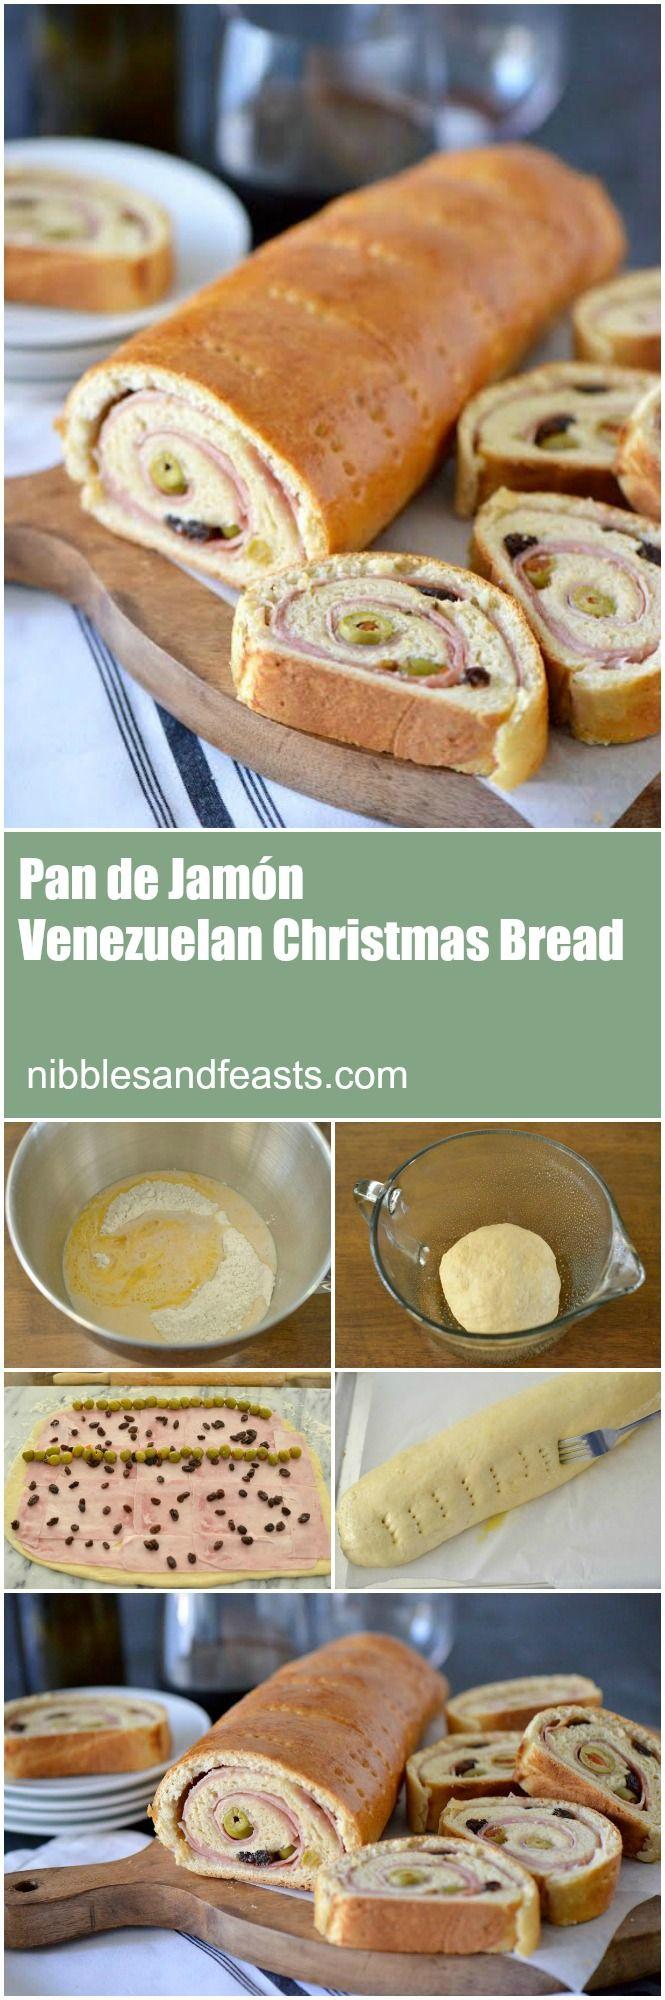 Venezuelan easy recipes